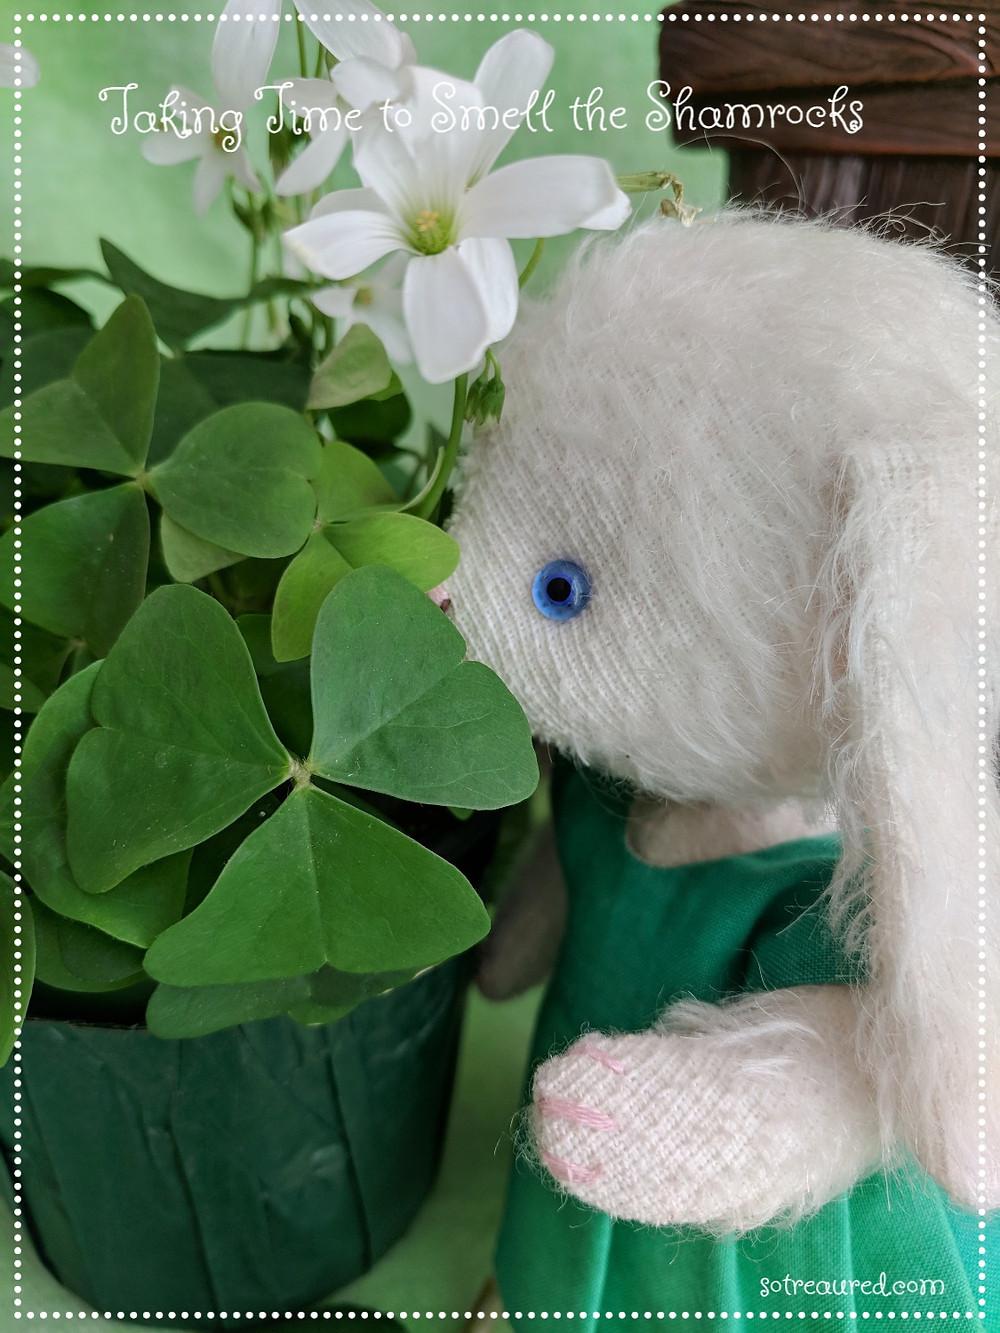 Sweet matilda bunny smells the shamrock -shaped leaves.